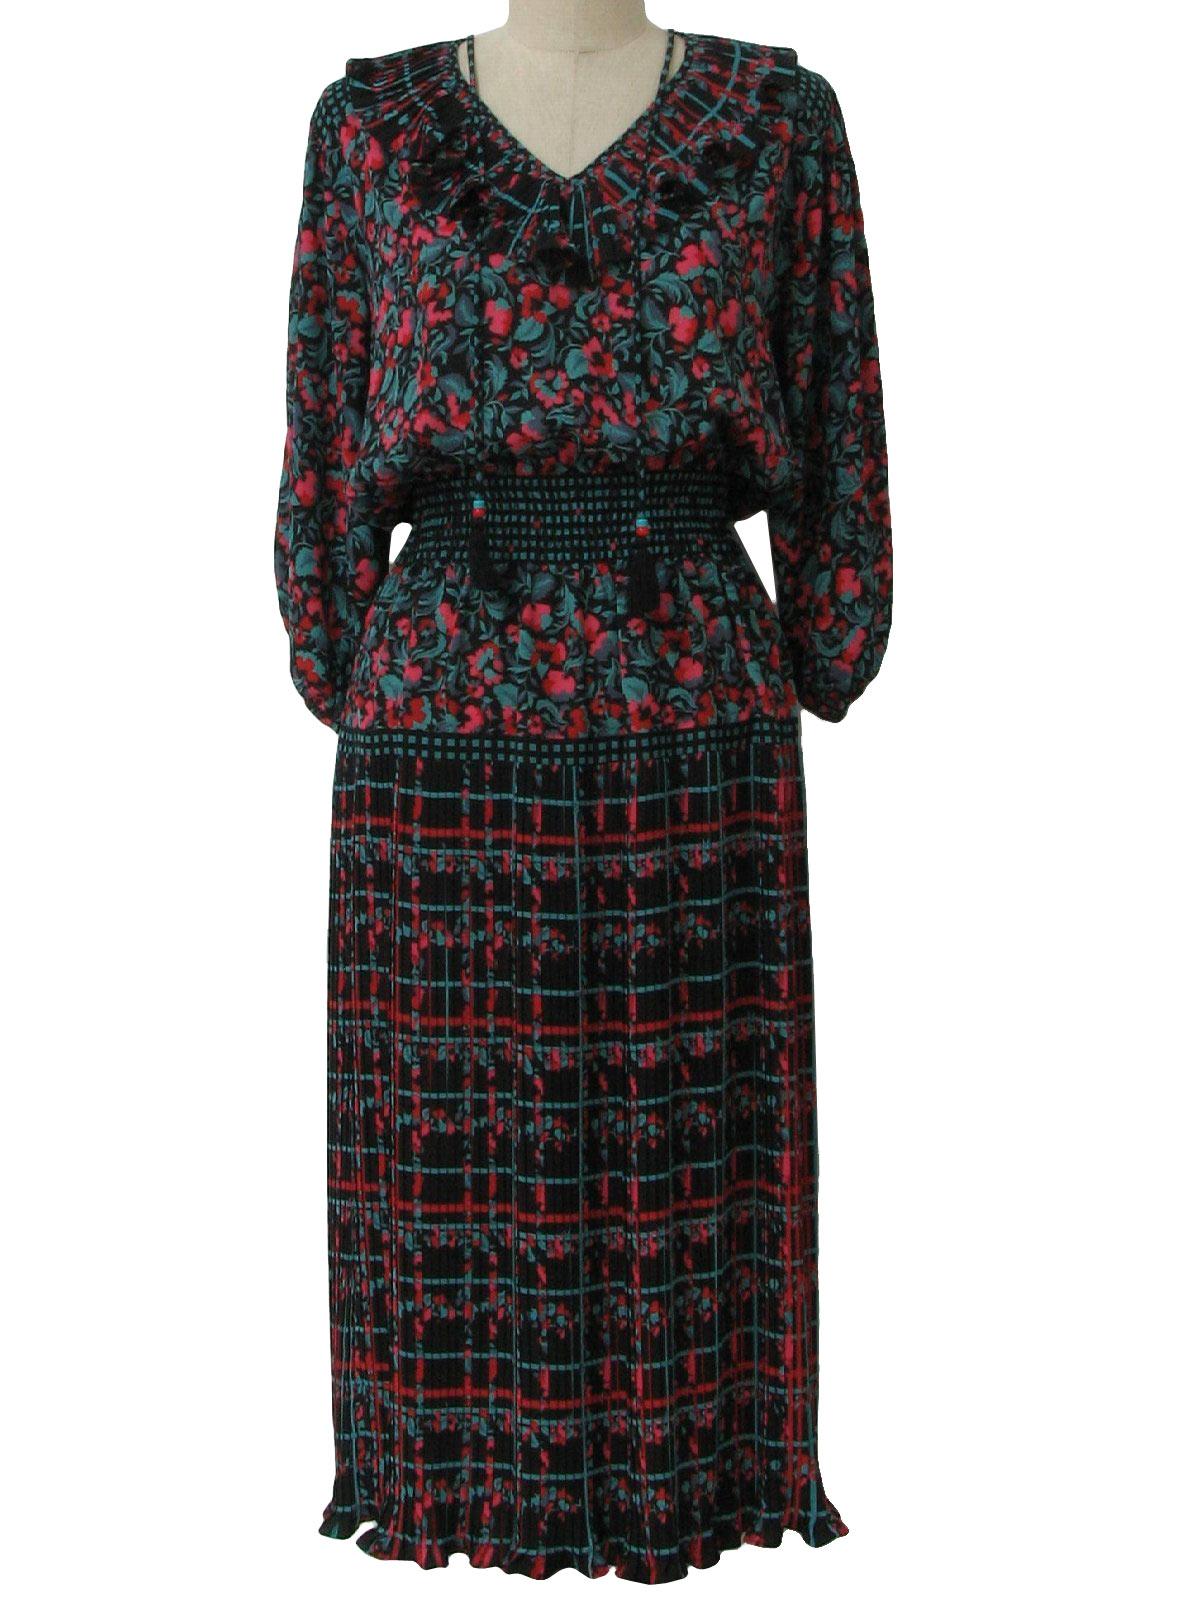 1980s Vintage Dress 80s Diane Freis Designer Womens